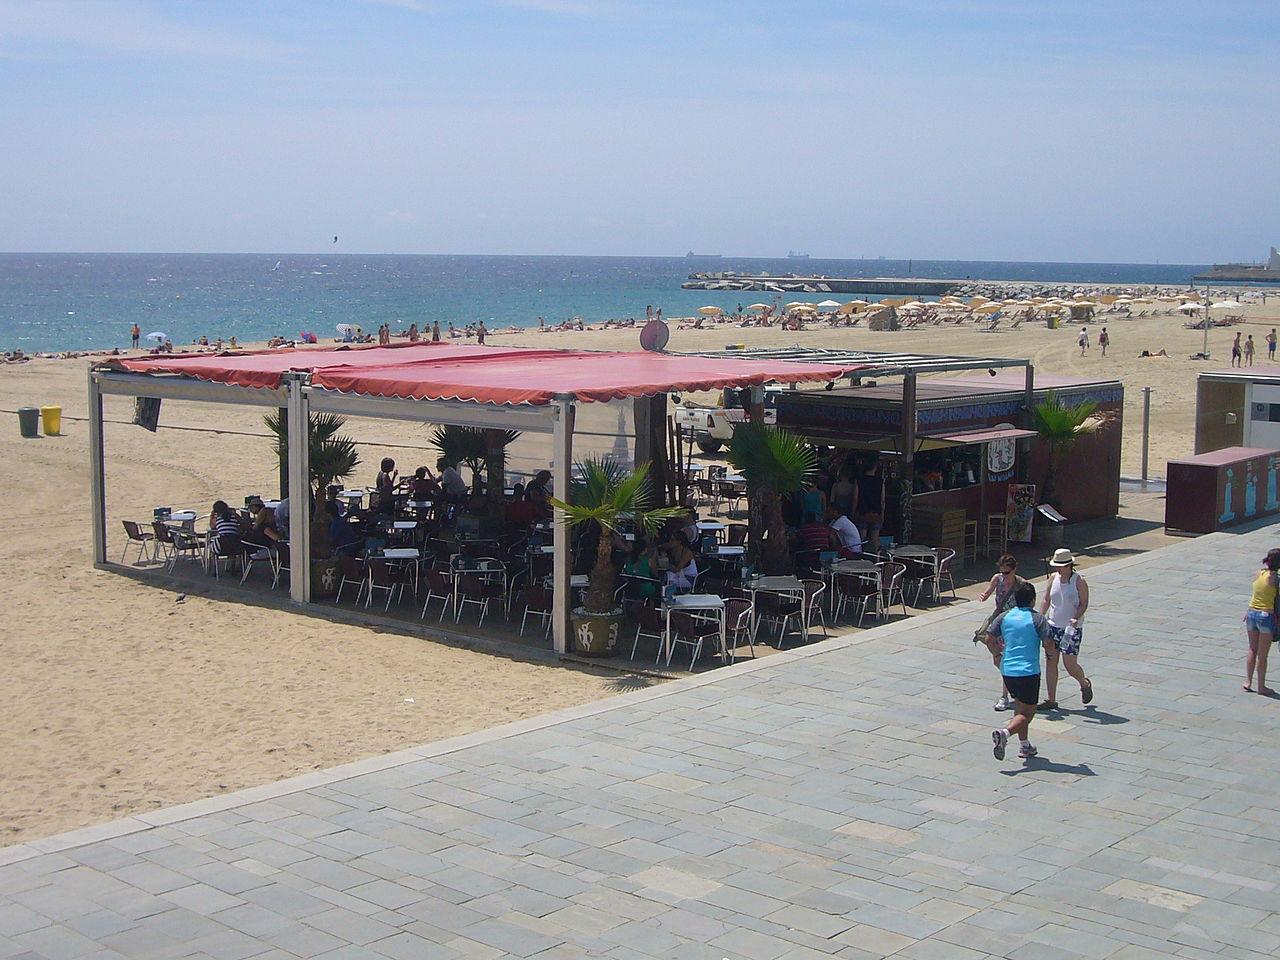 File:Platja del Bogatell (Barcelona) 03.JPG - Wikimedia Commons